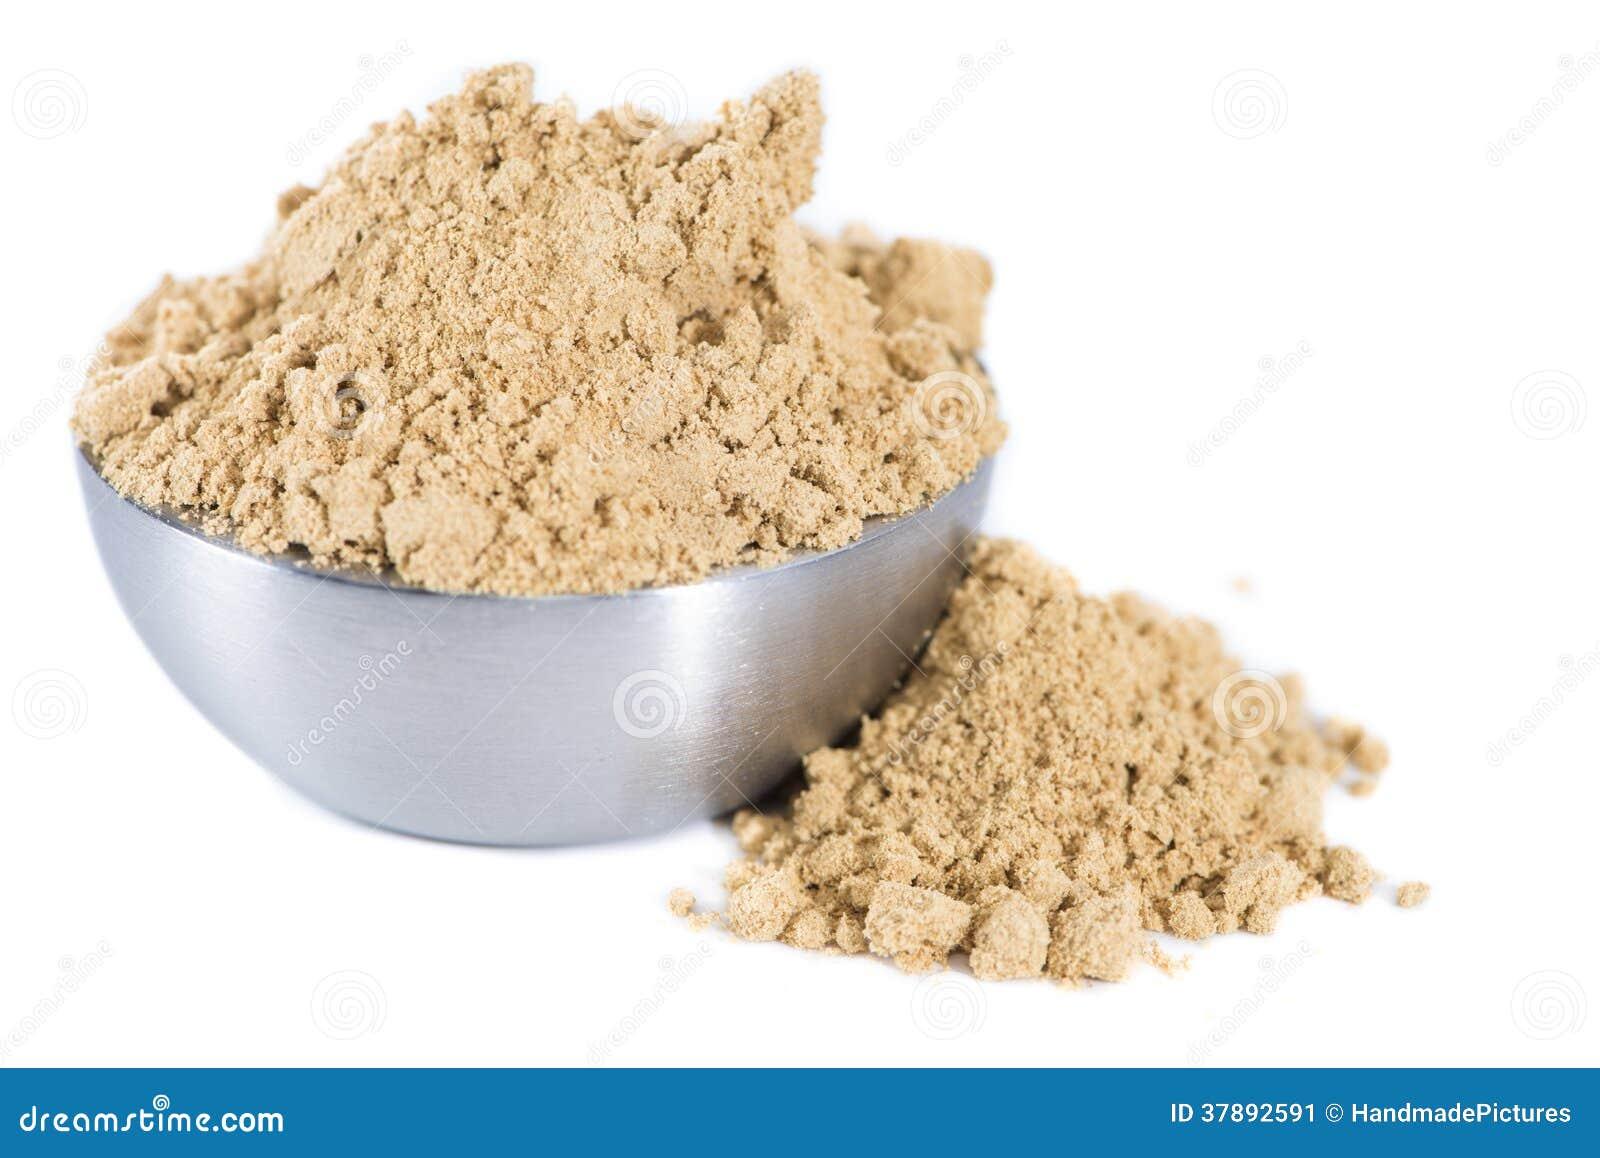 Geïsoleerd Ginger Powder